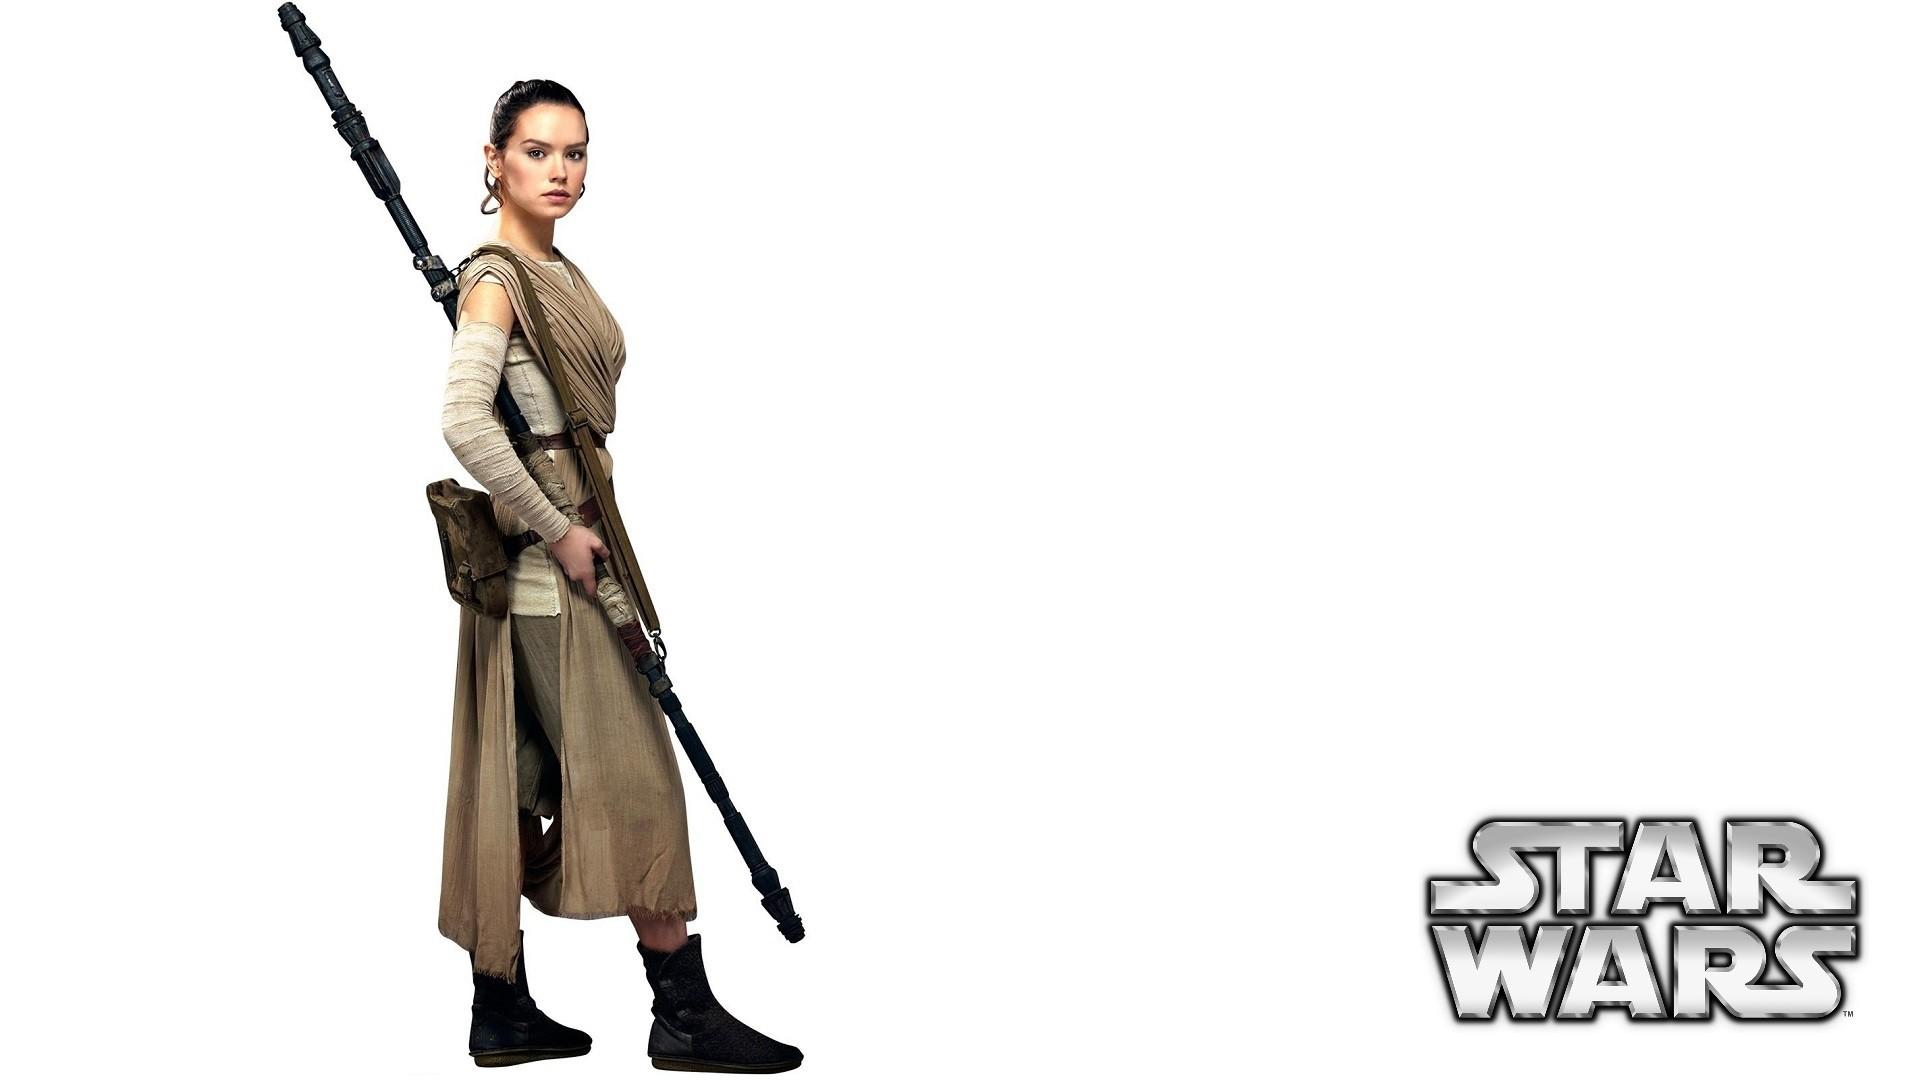 Star Wars Force Awakens 1080p: Rey Star Wars Wallpaper (74+ Images